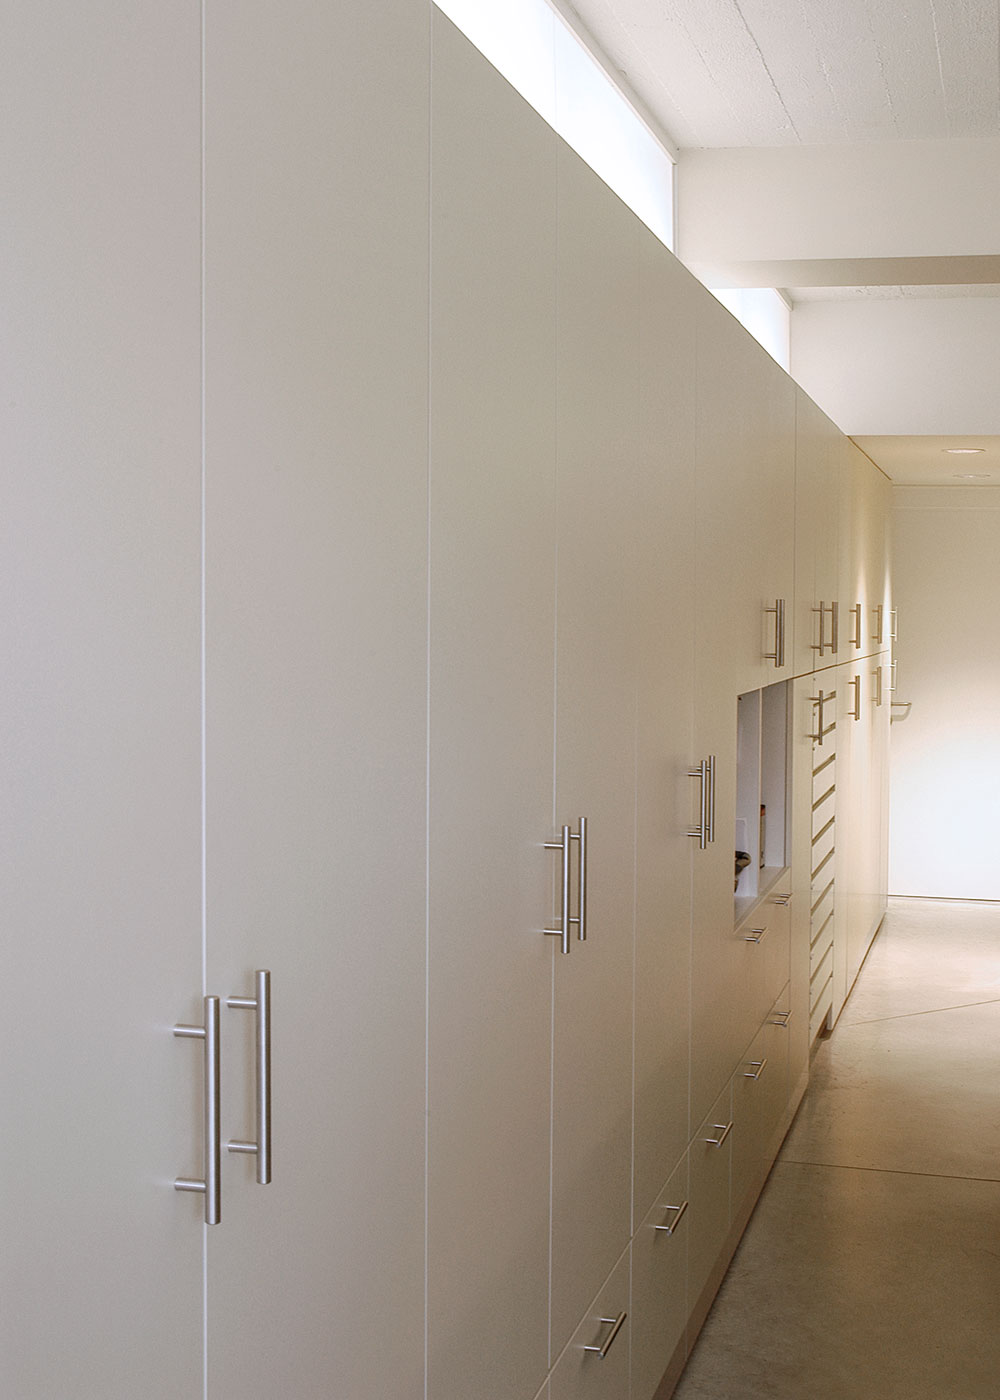 Apotheek-Debeule_Renovatie_Interieur_kastenwand.jpg